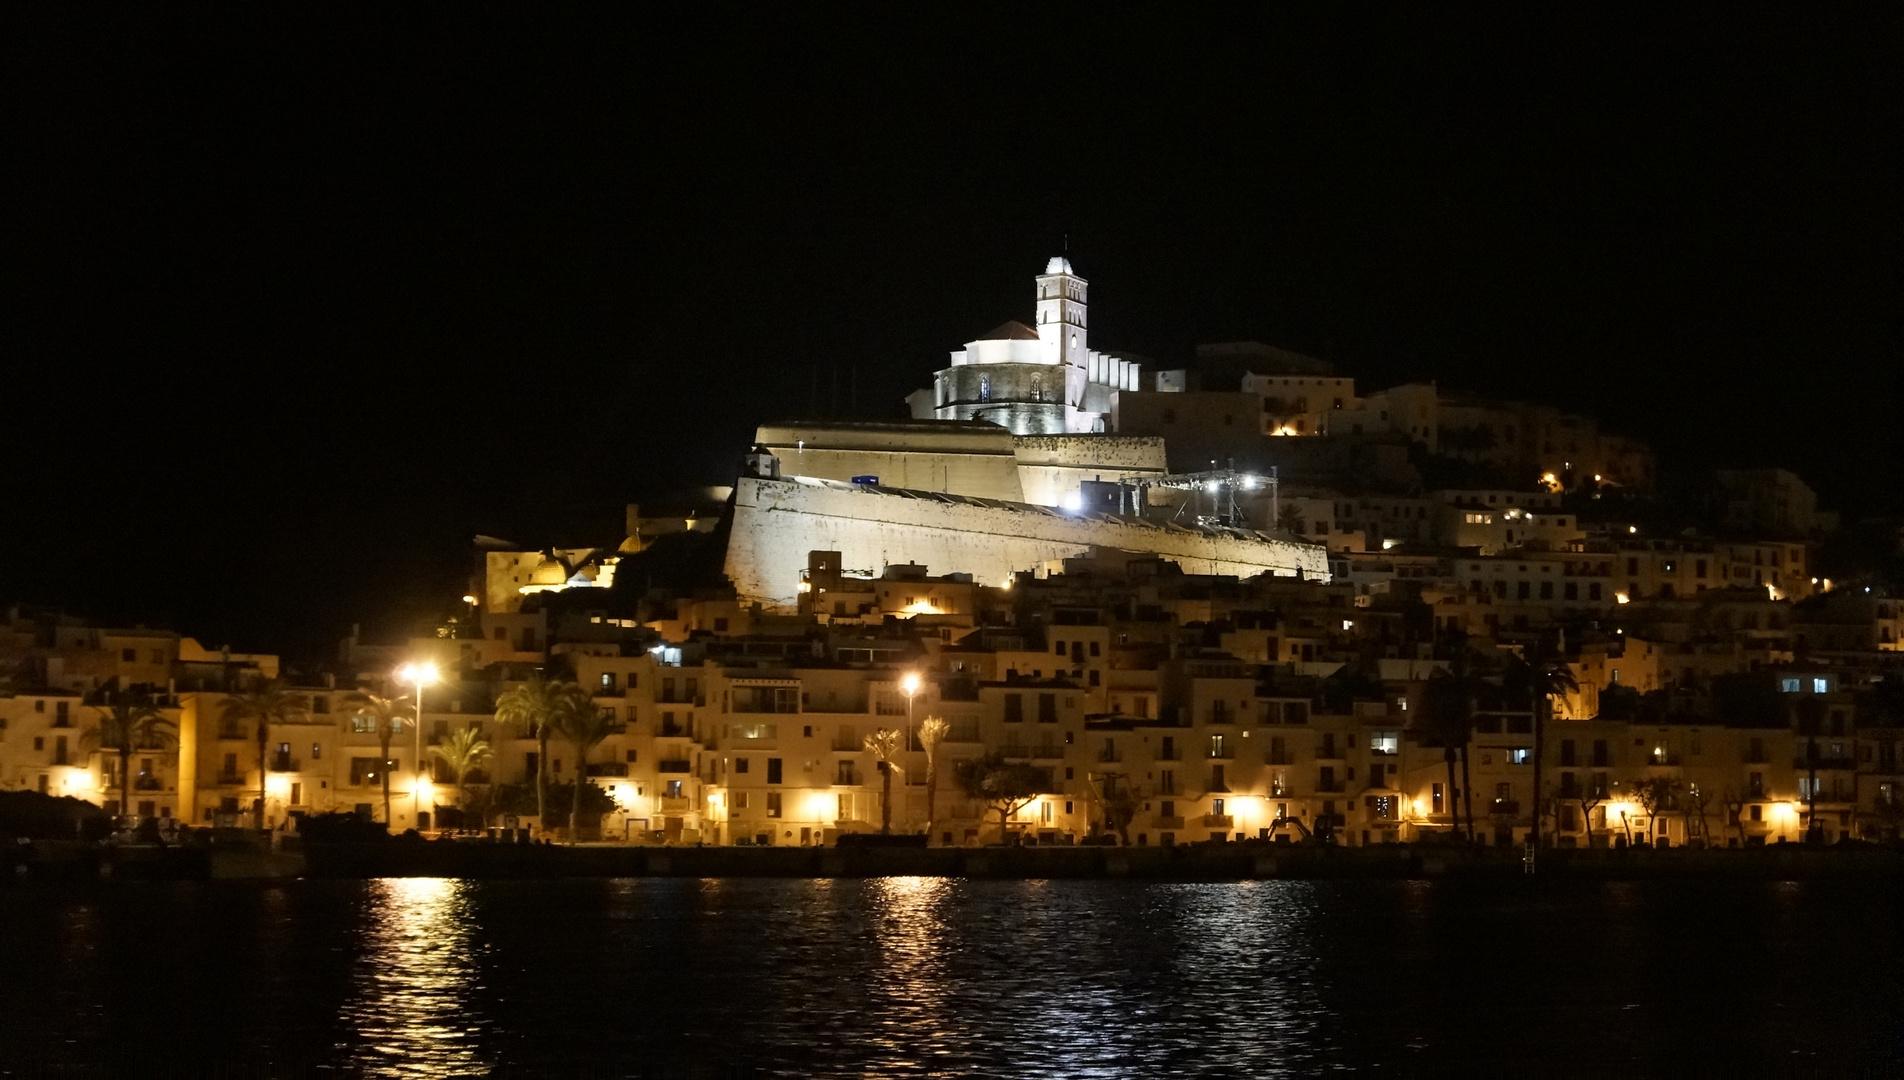 La citadelle d'Eivissa